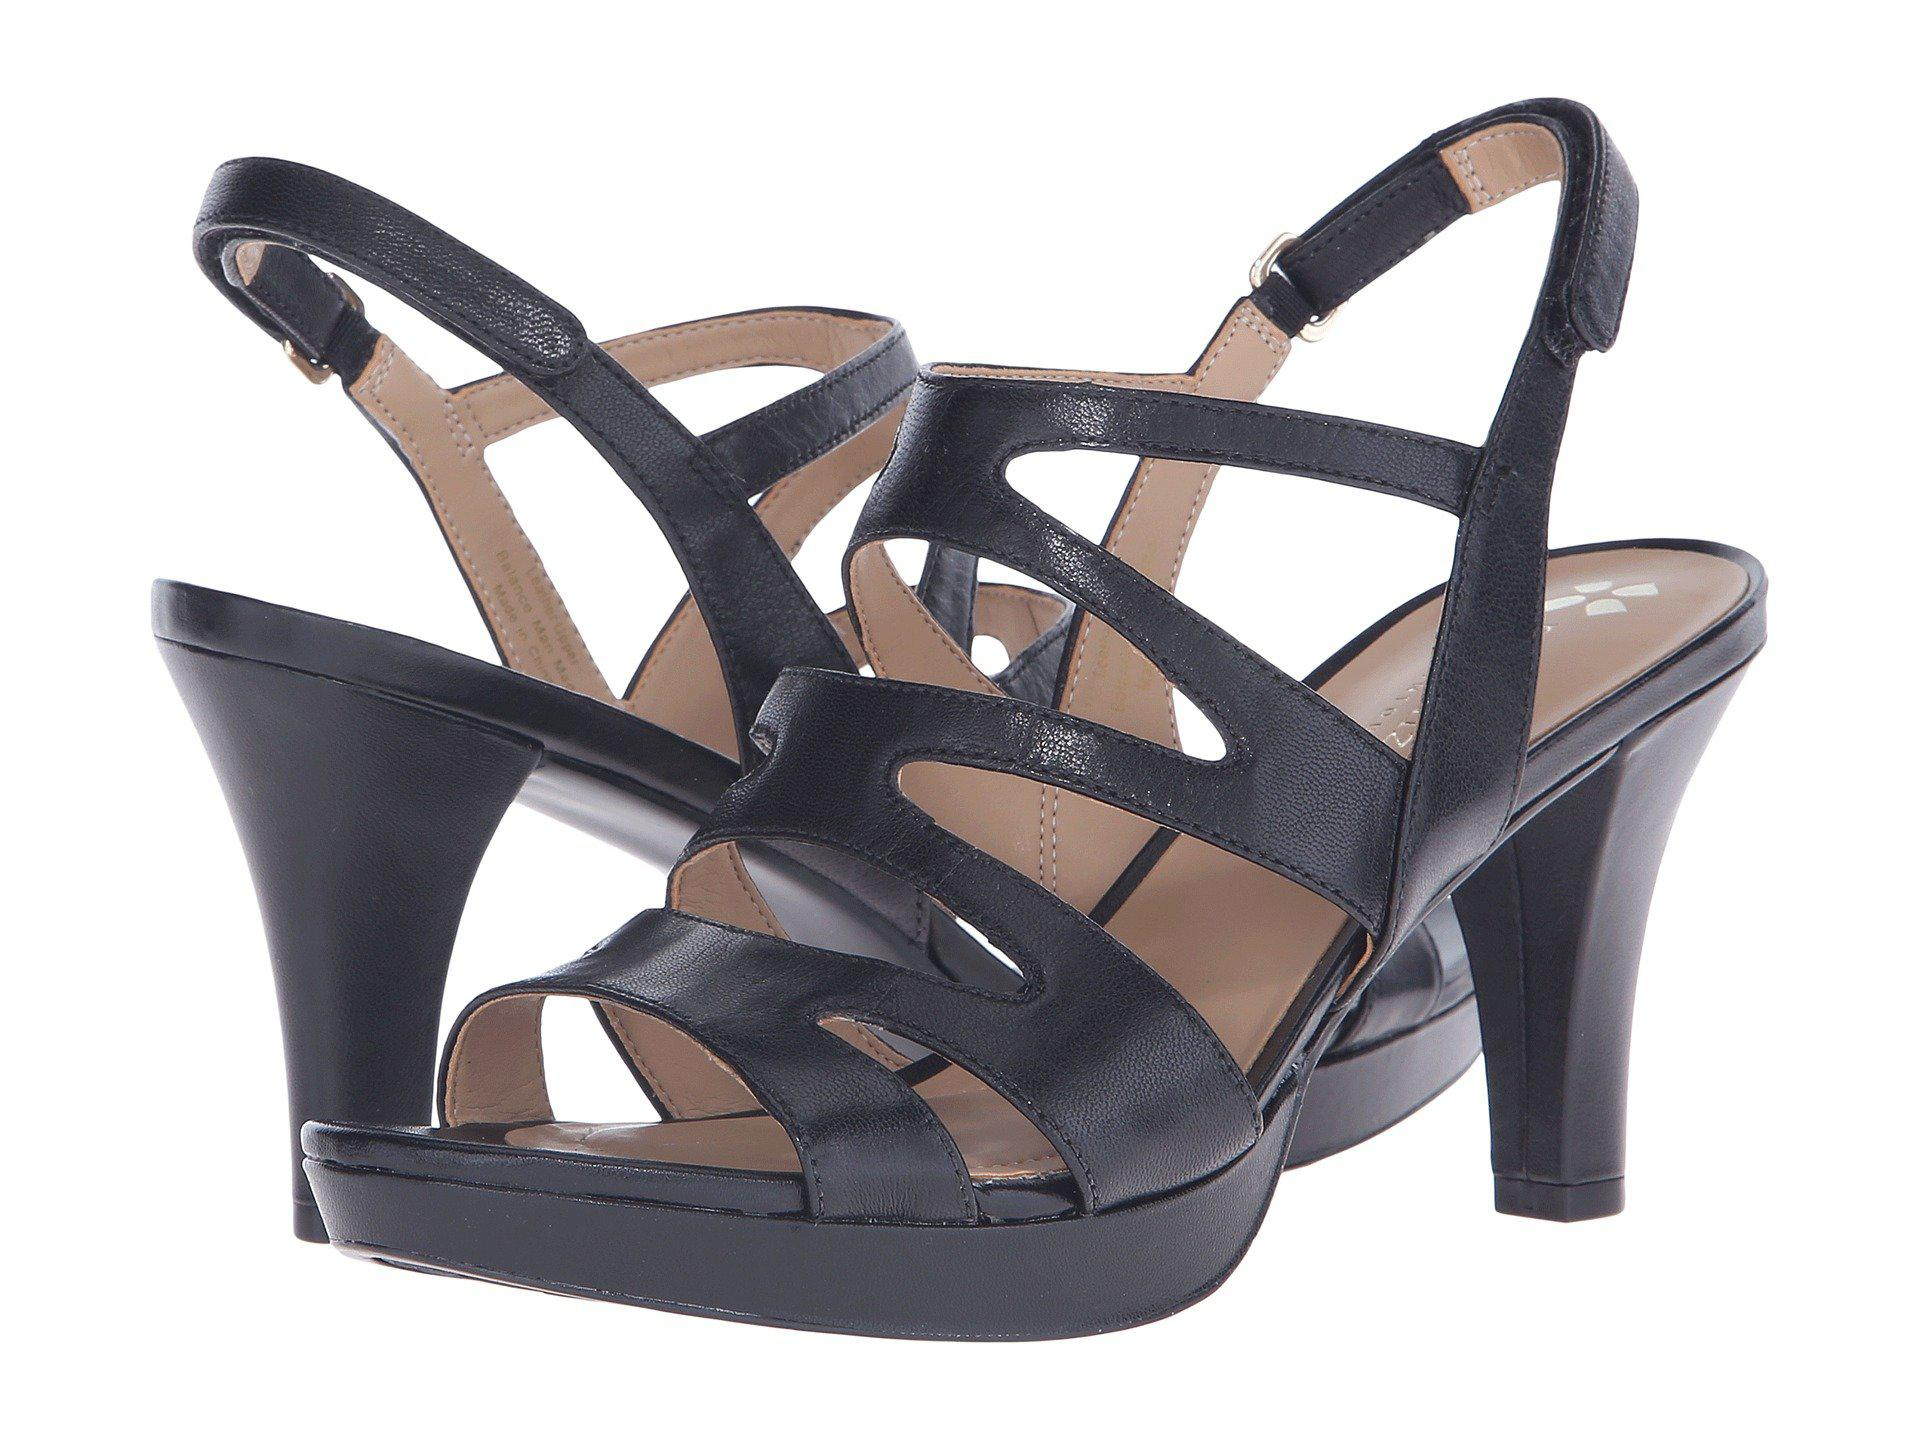 5ec0e30ef374 Naturalizer - Black Pressley (taupe Leather) High Heels - Lyst. View  fullscreen